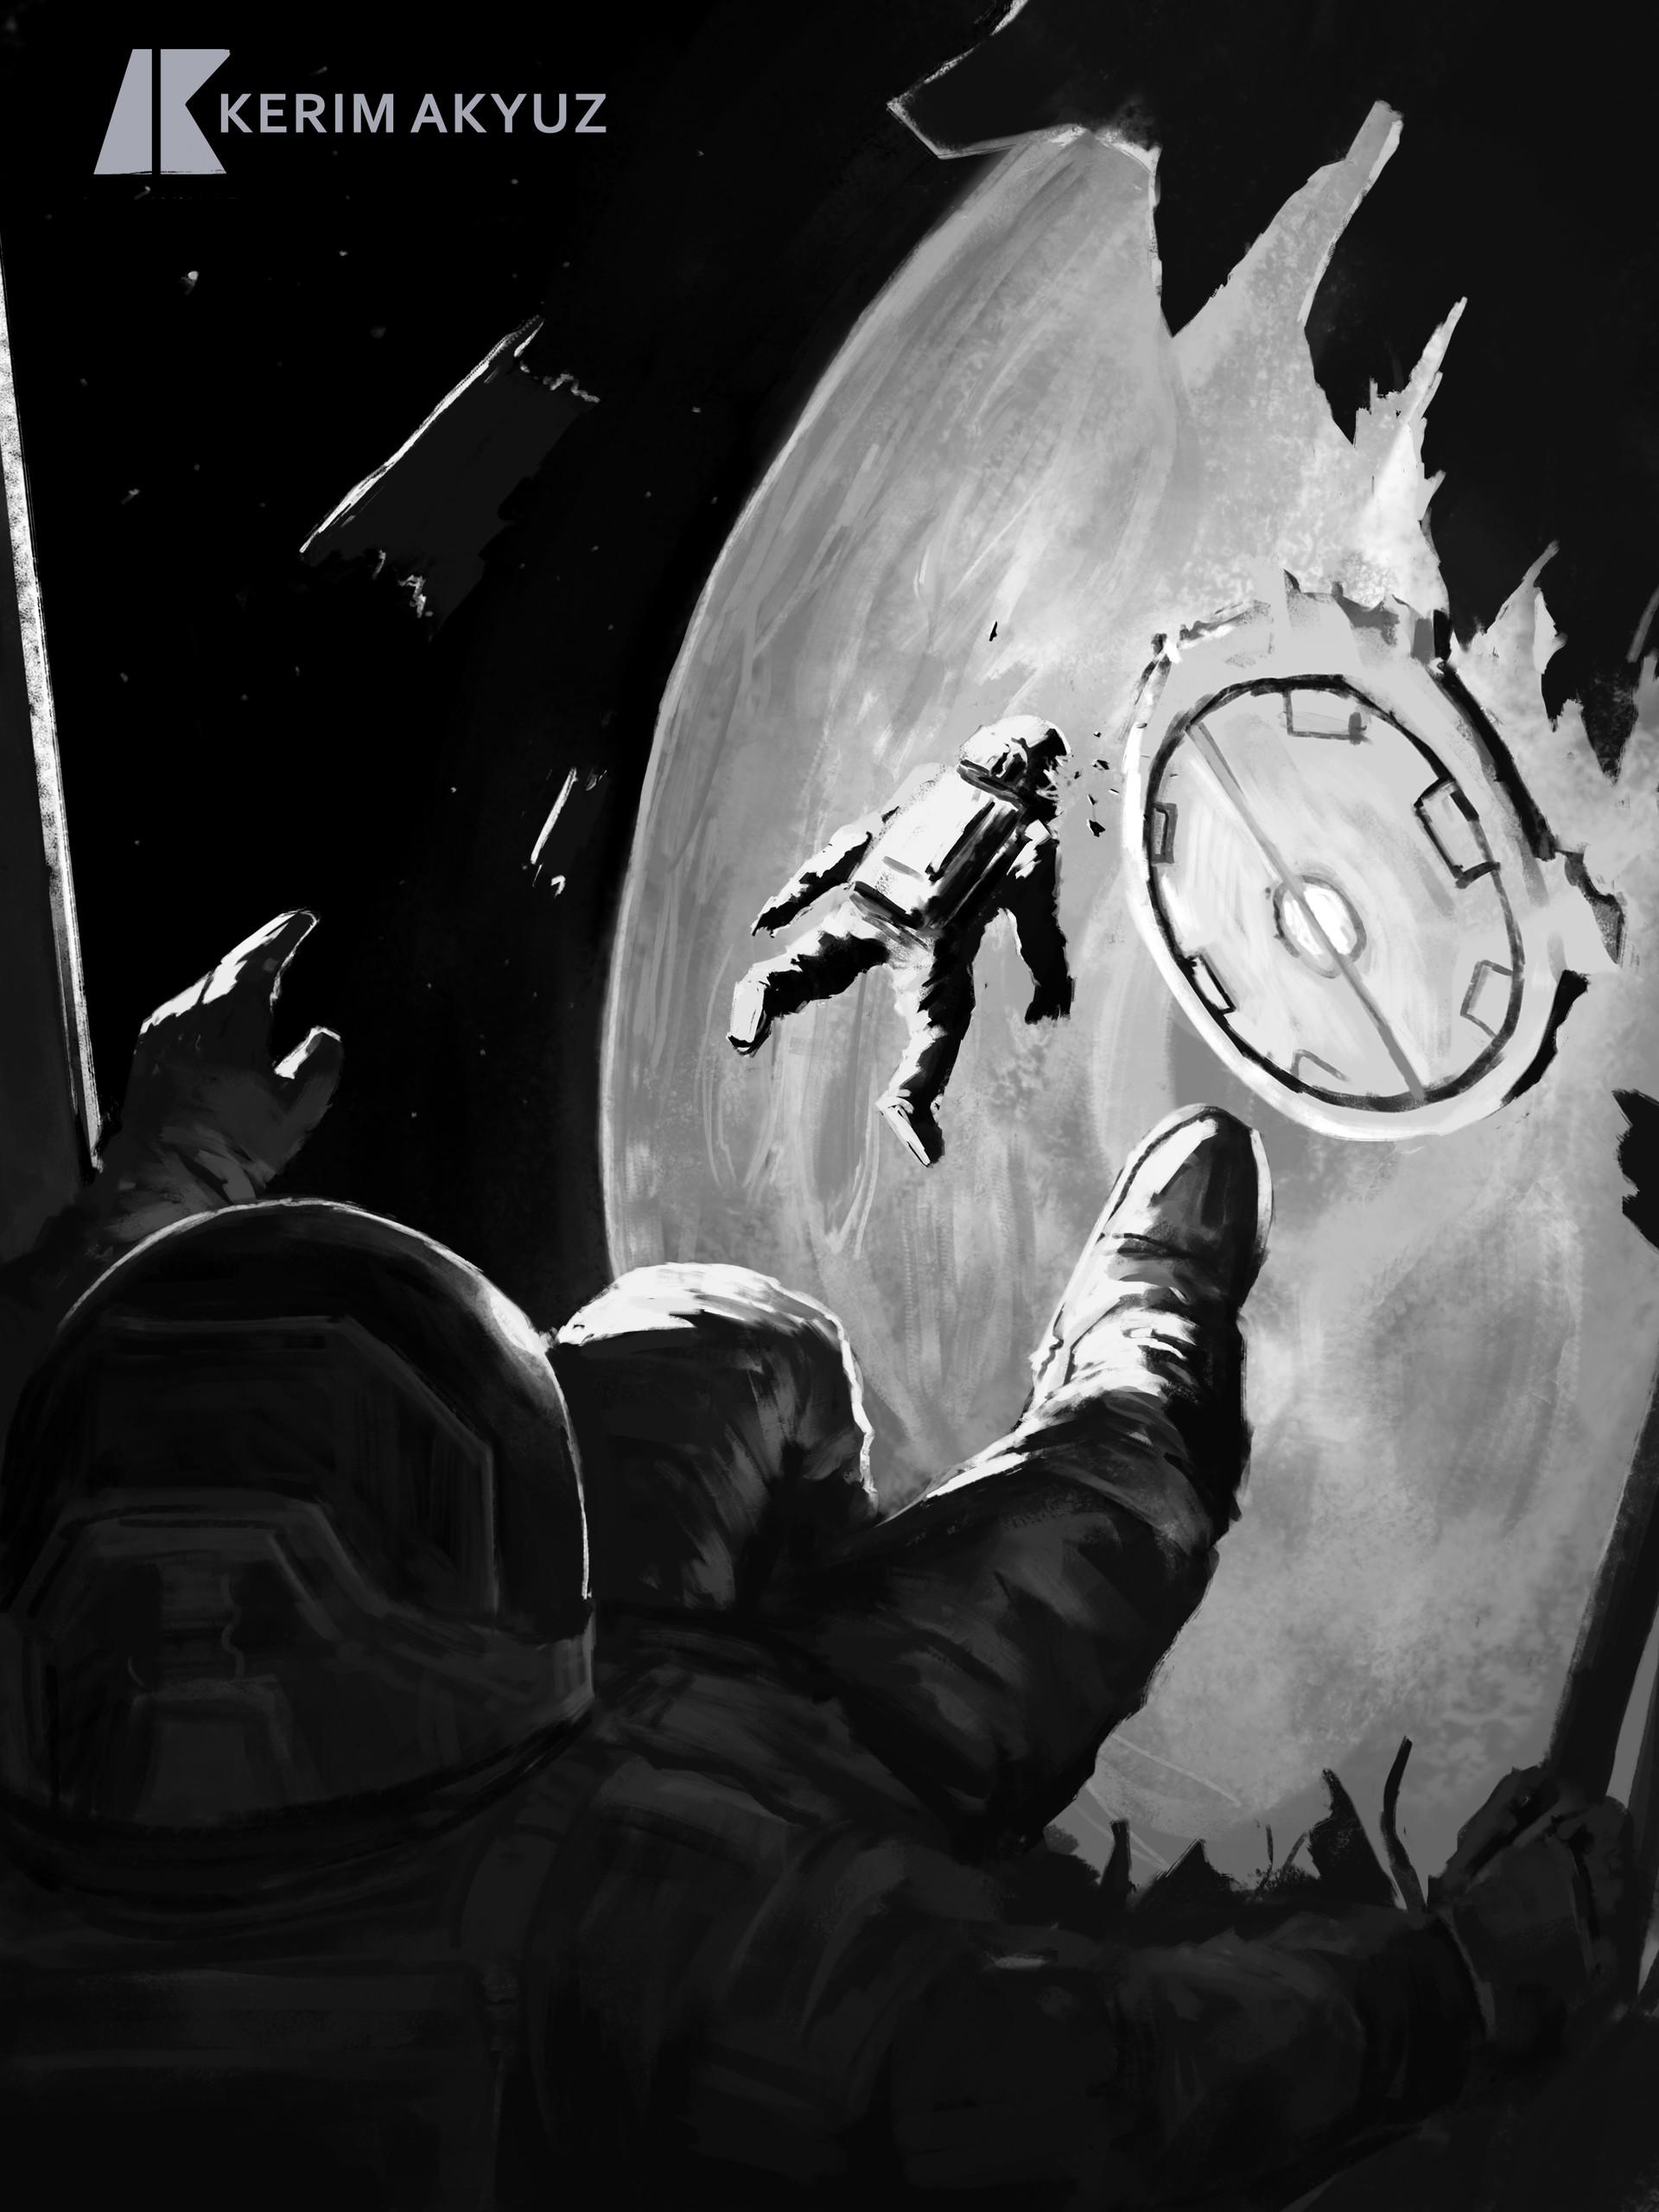 Kerim akyuz 177 astronautslife4